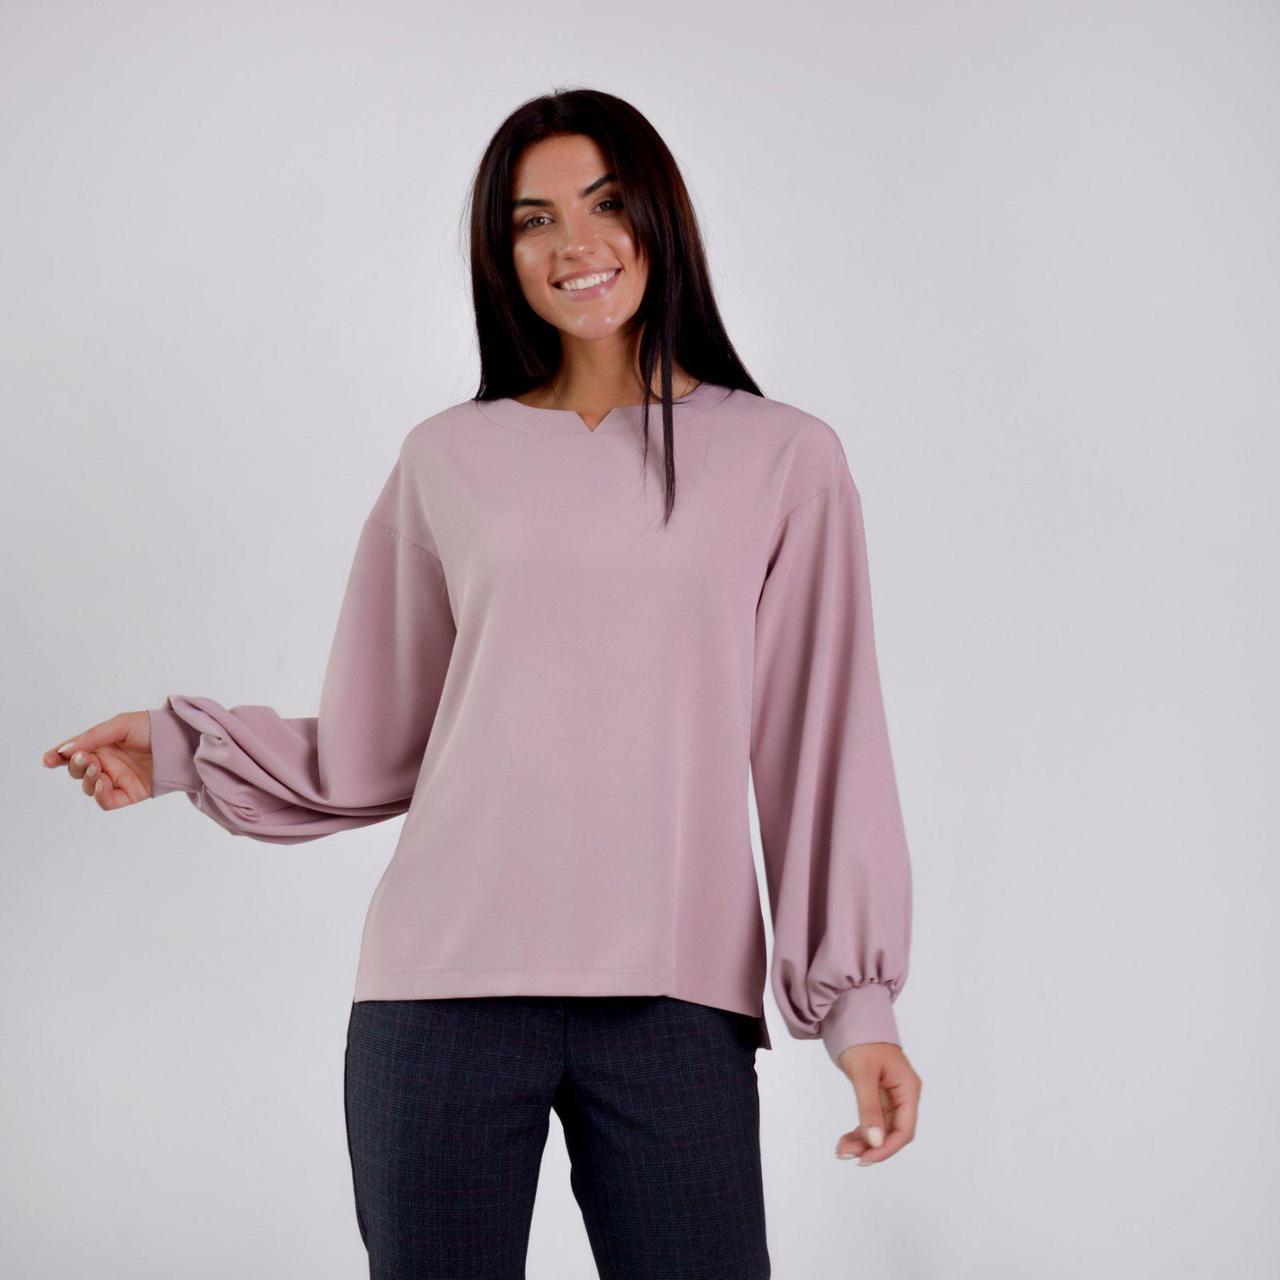 Вишукана молодіжна блуза Дана, 44,46,48,50,52,54